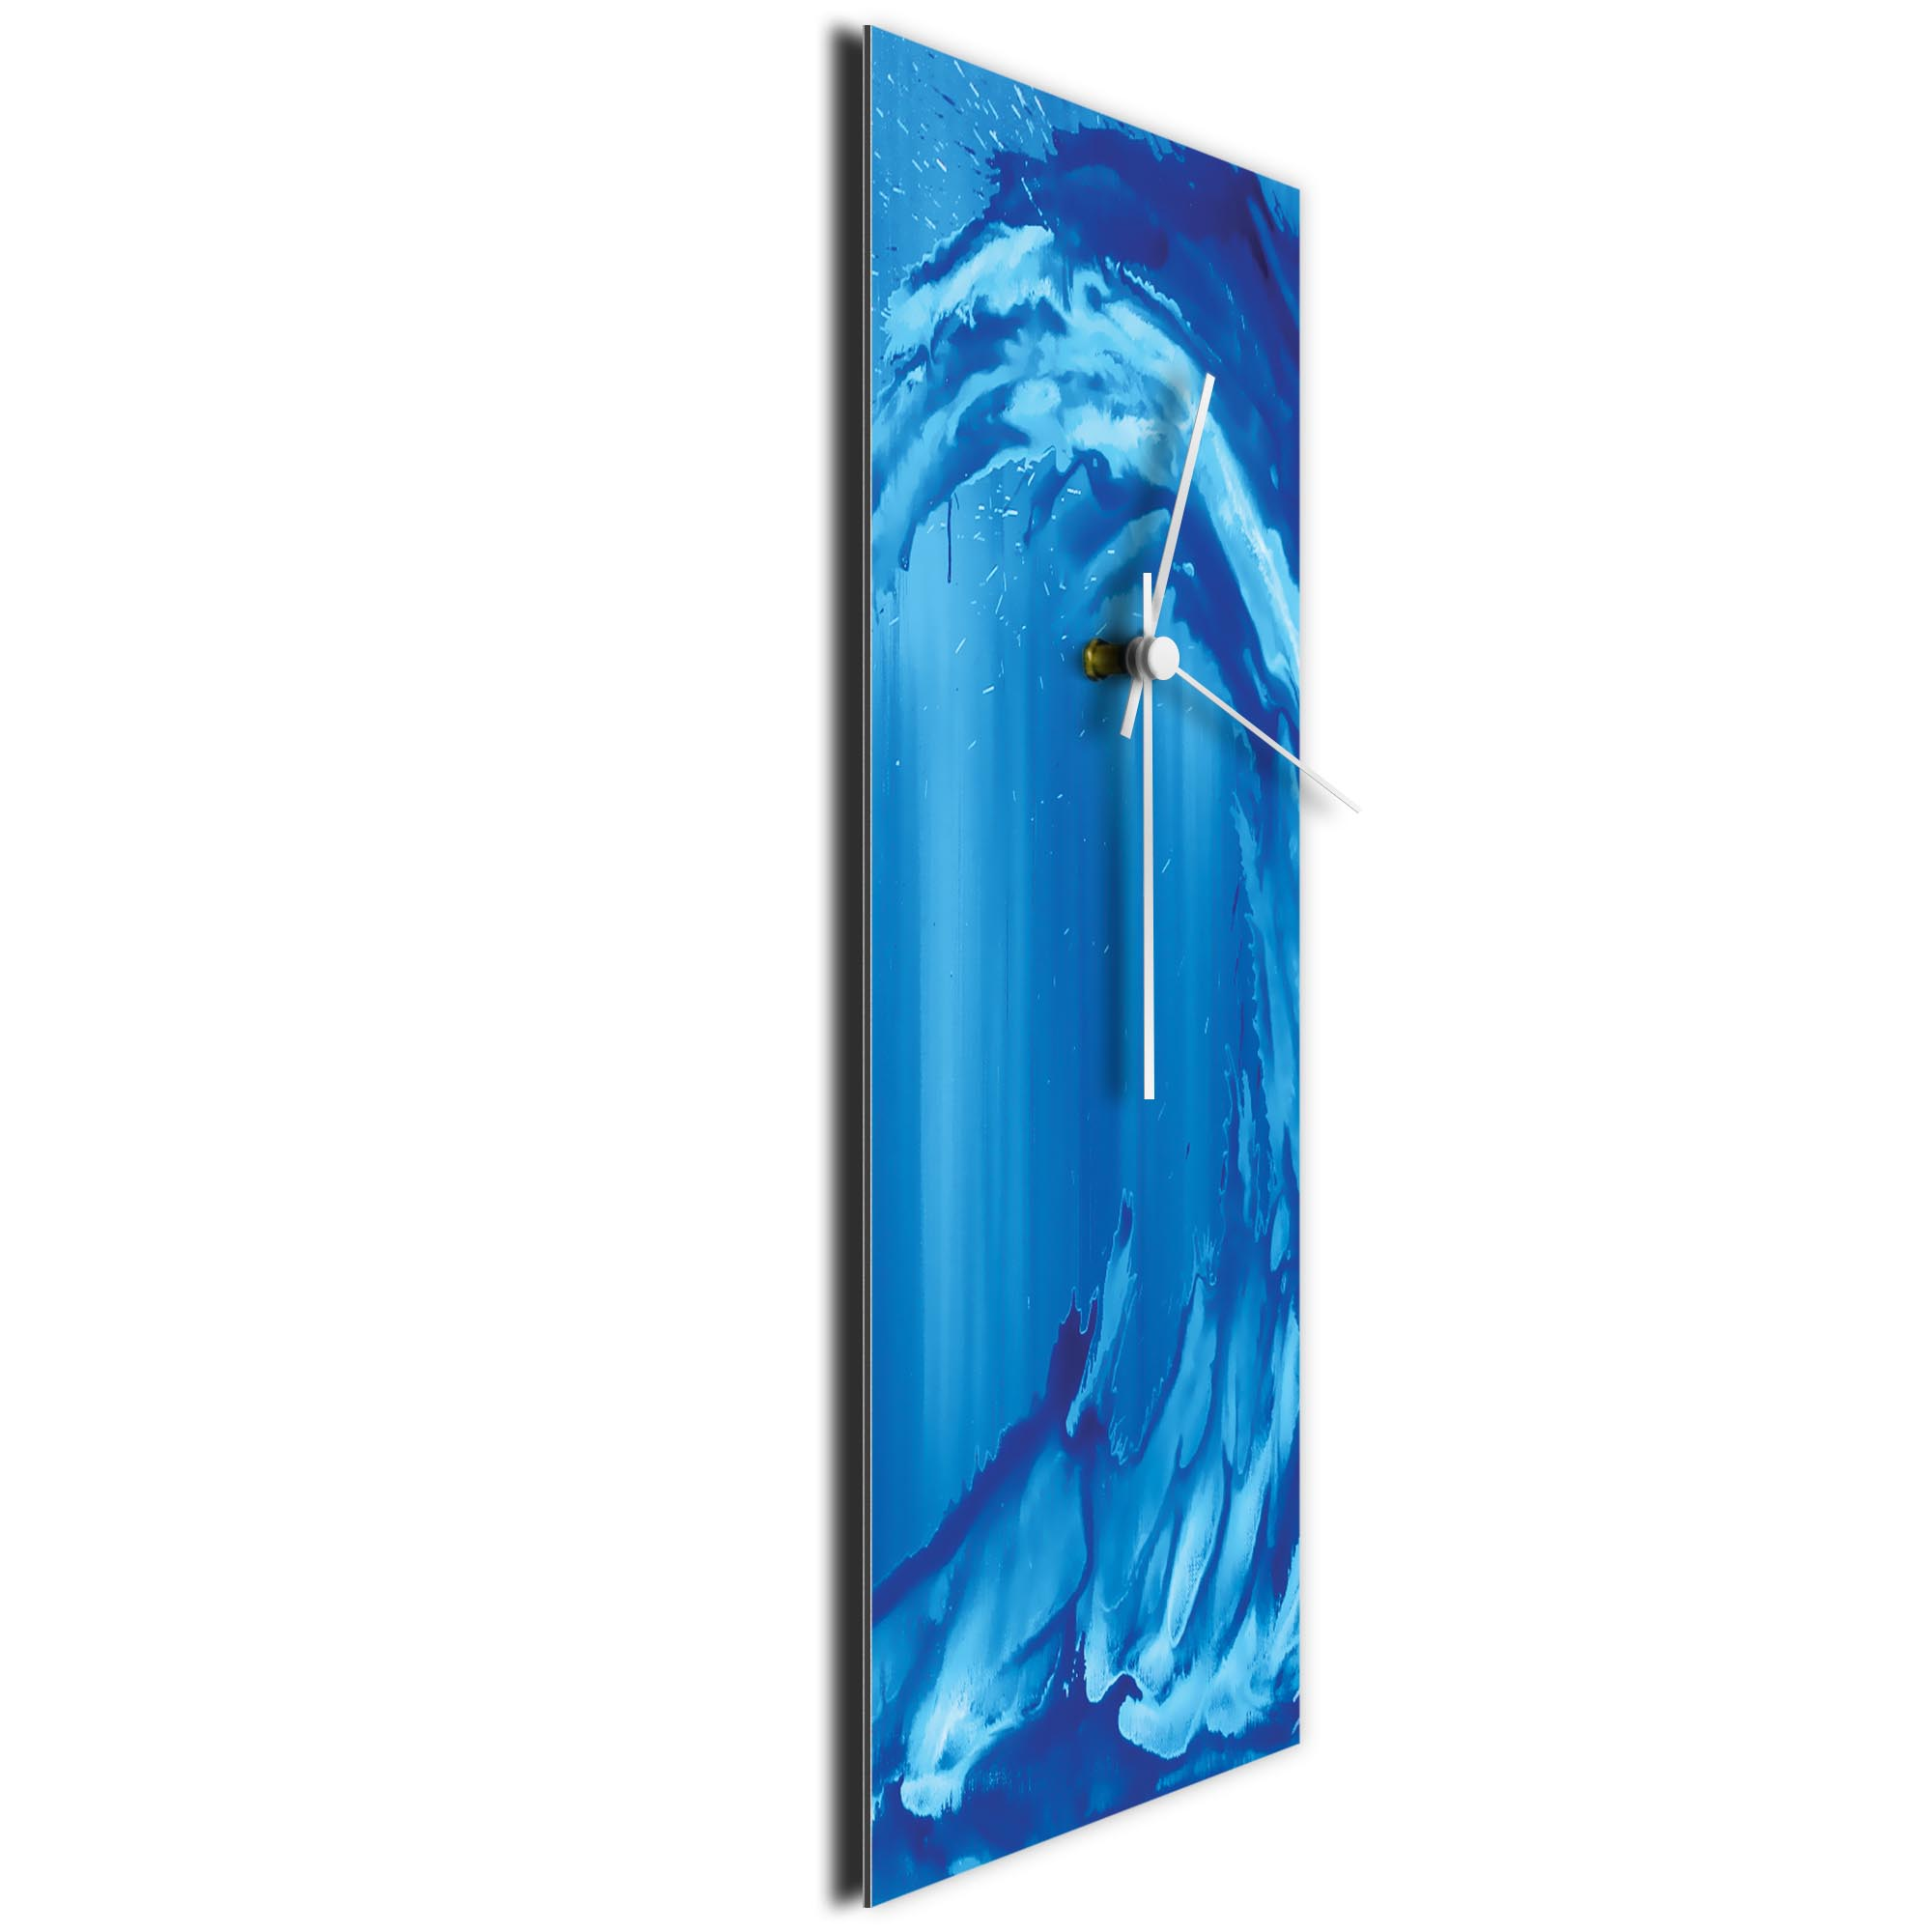 Blue Wave v2 Clock Large by Mendo Vasilevski - Urban Abstract Home Decor - Image 3